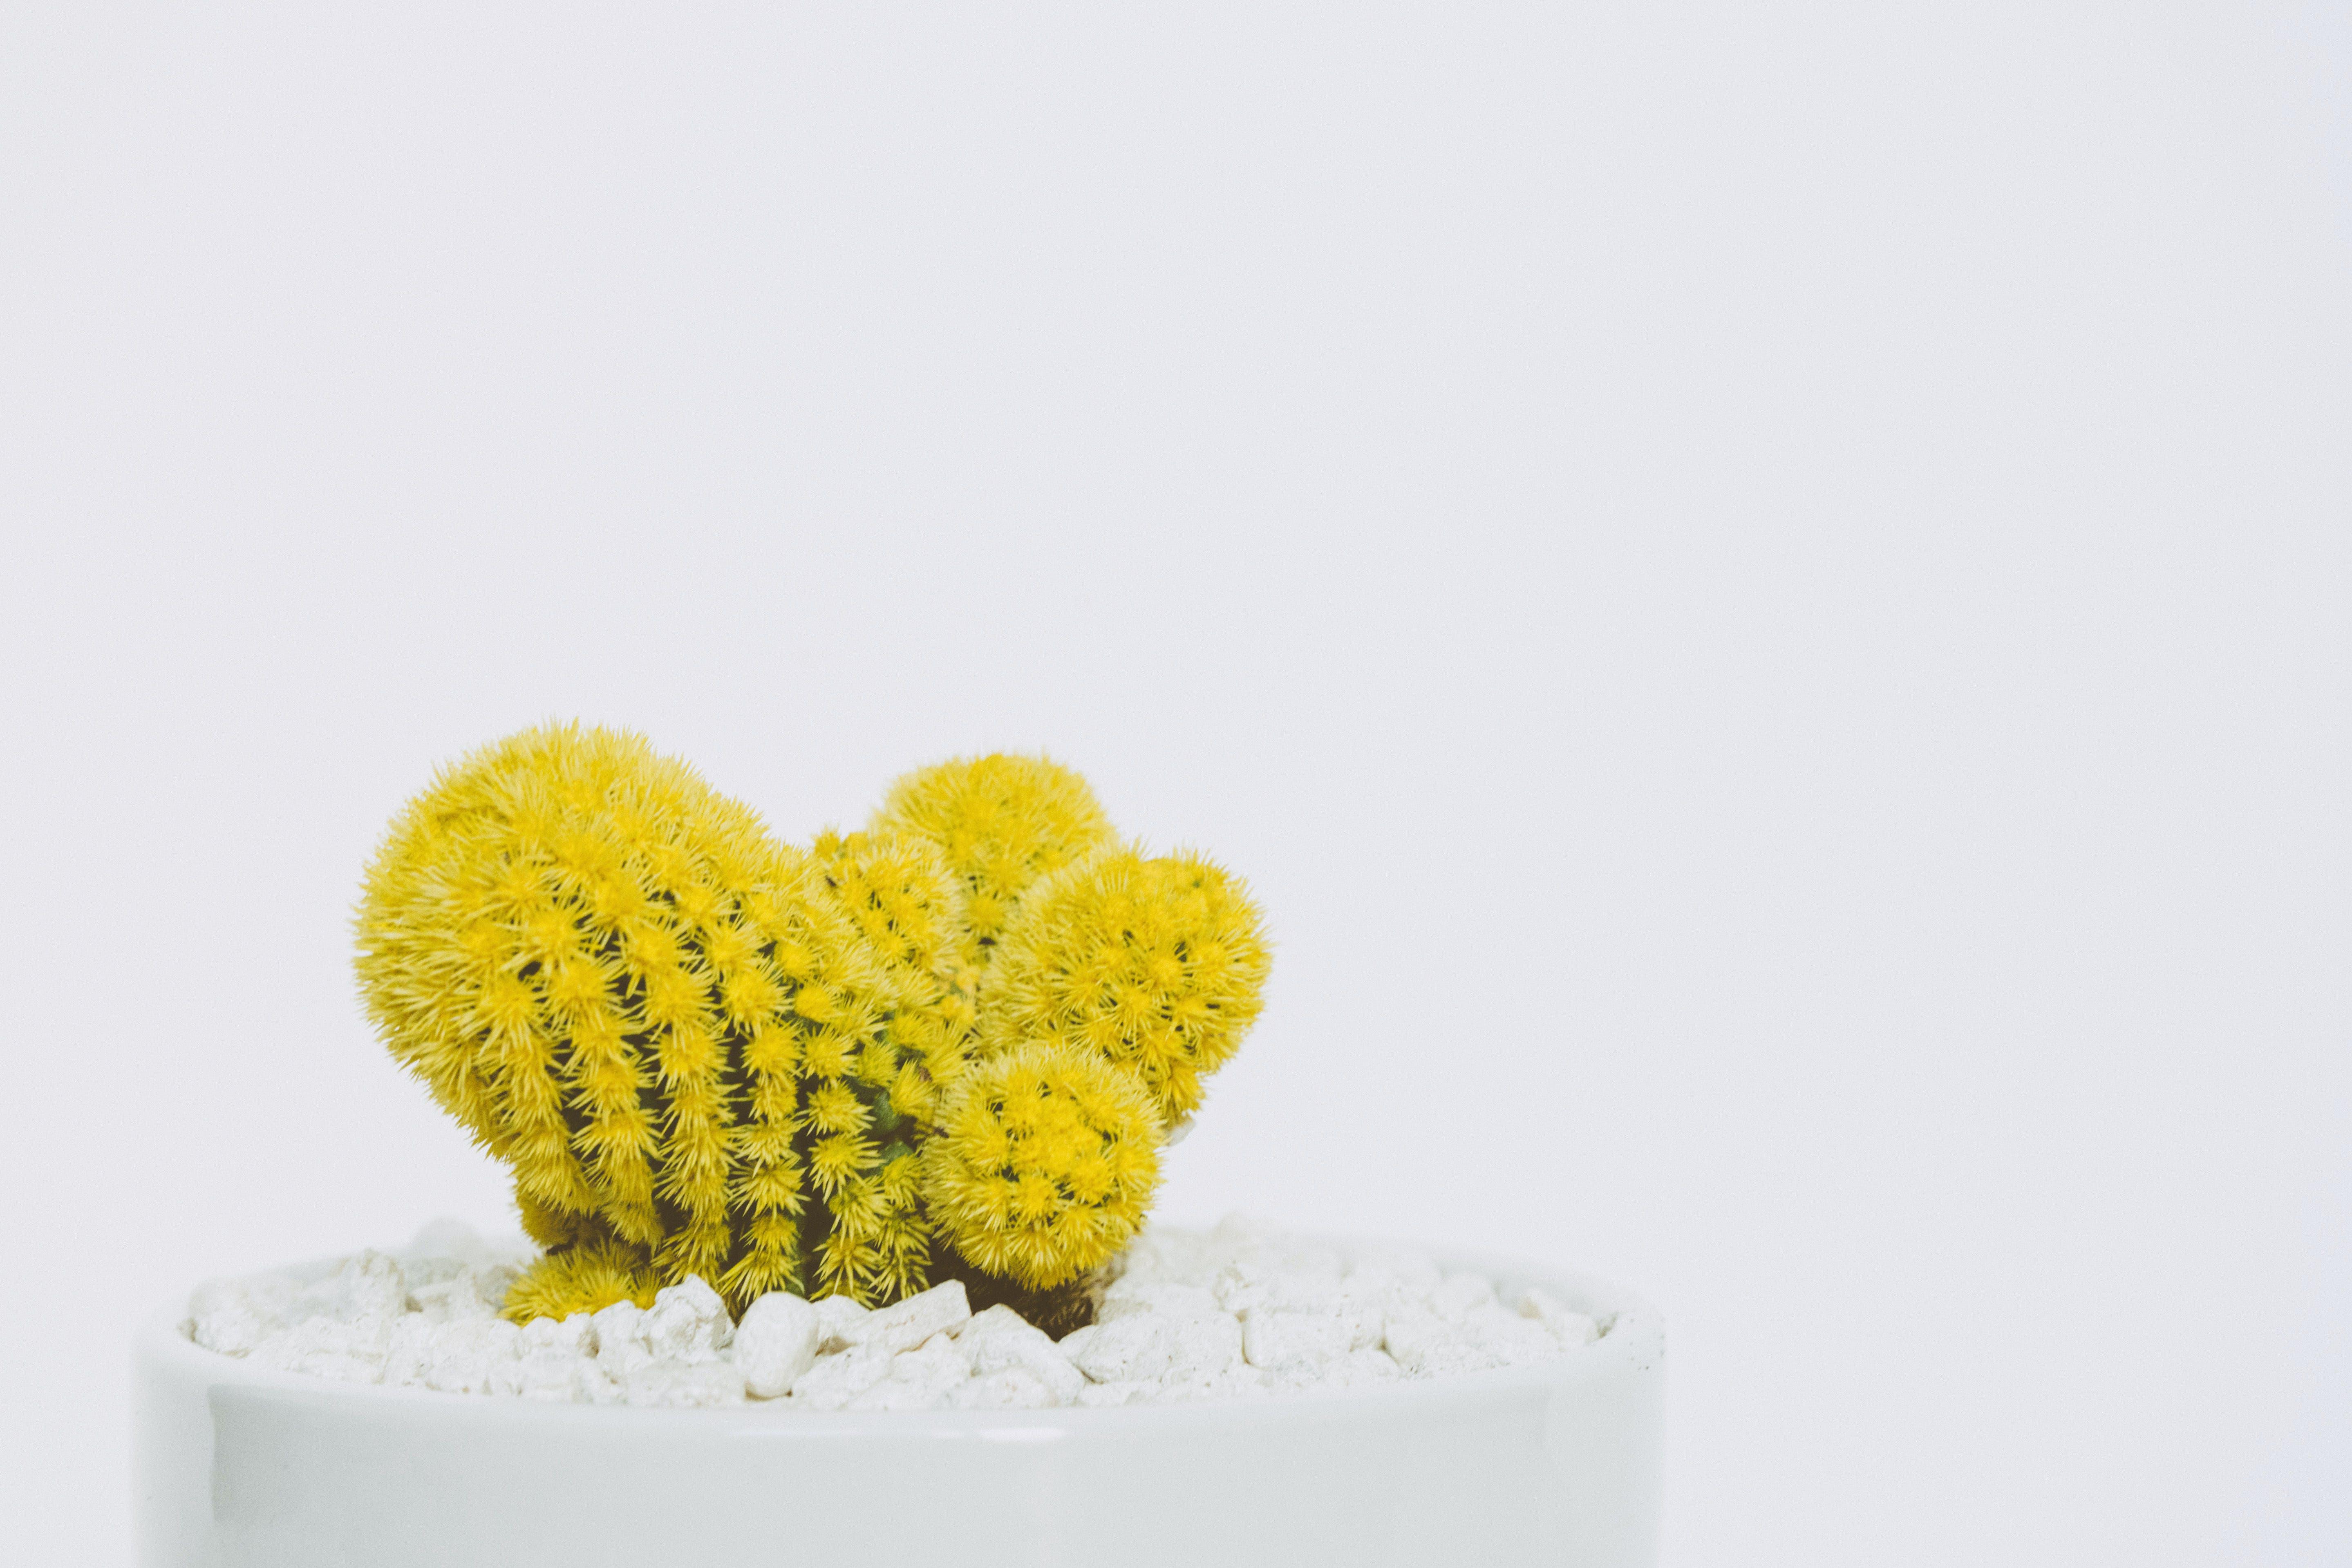 Green Cactus Plant in Pot